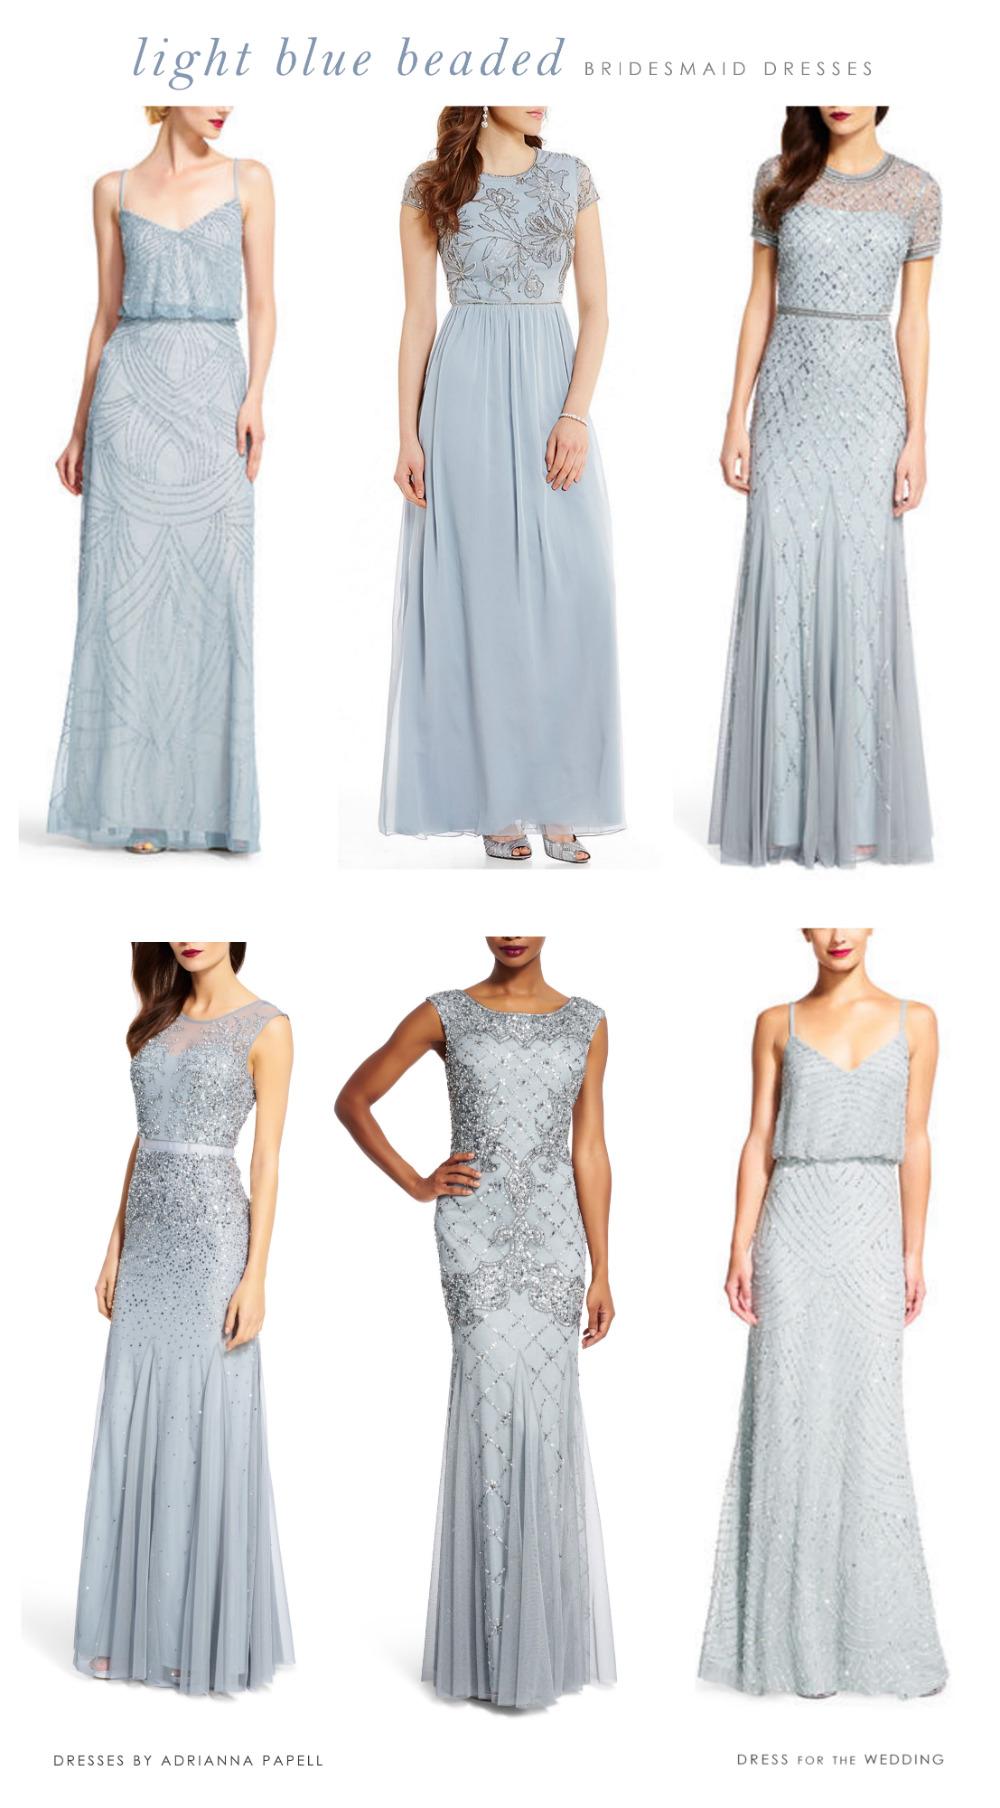 Light Blue Mix And Match Bridesmaid Dresses Dress For